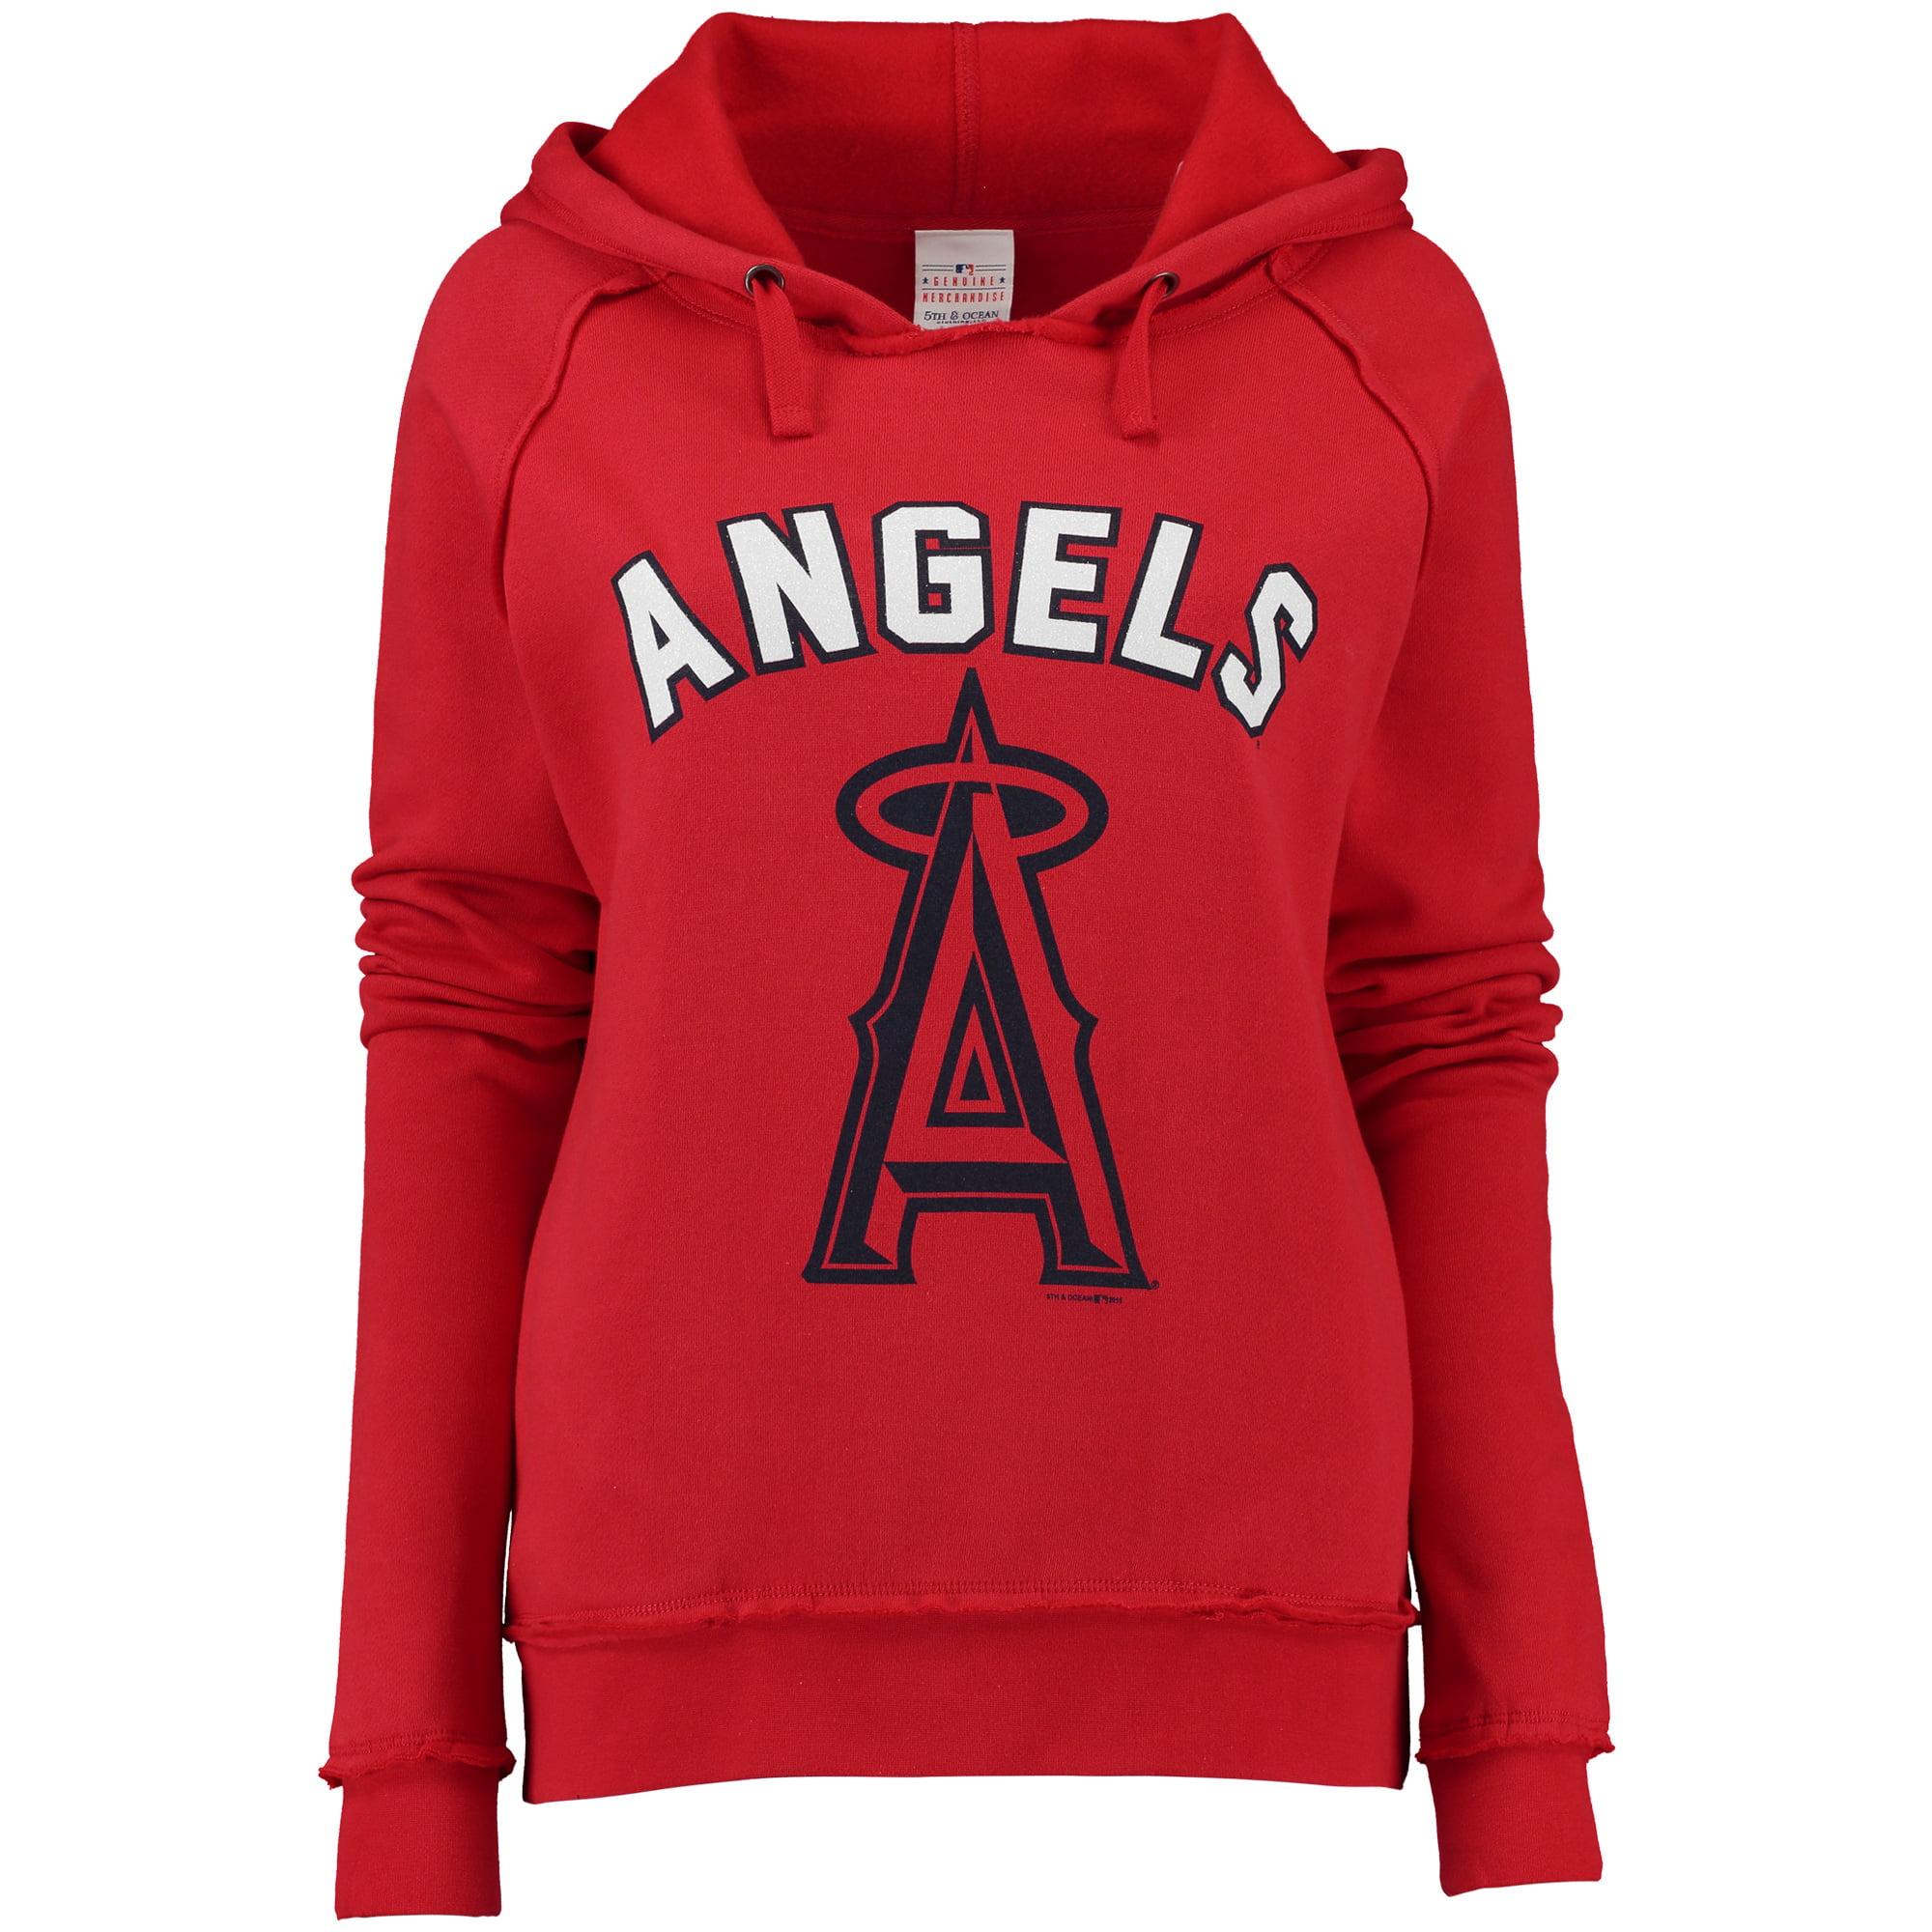 Los Angeles Angels 5th & Ocean by New Era Women's Hot Corner Pullover Hoodie - Red